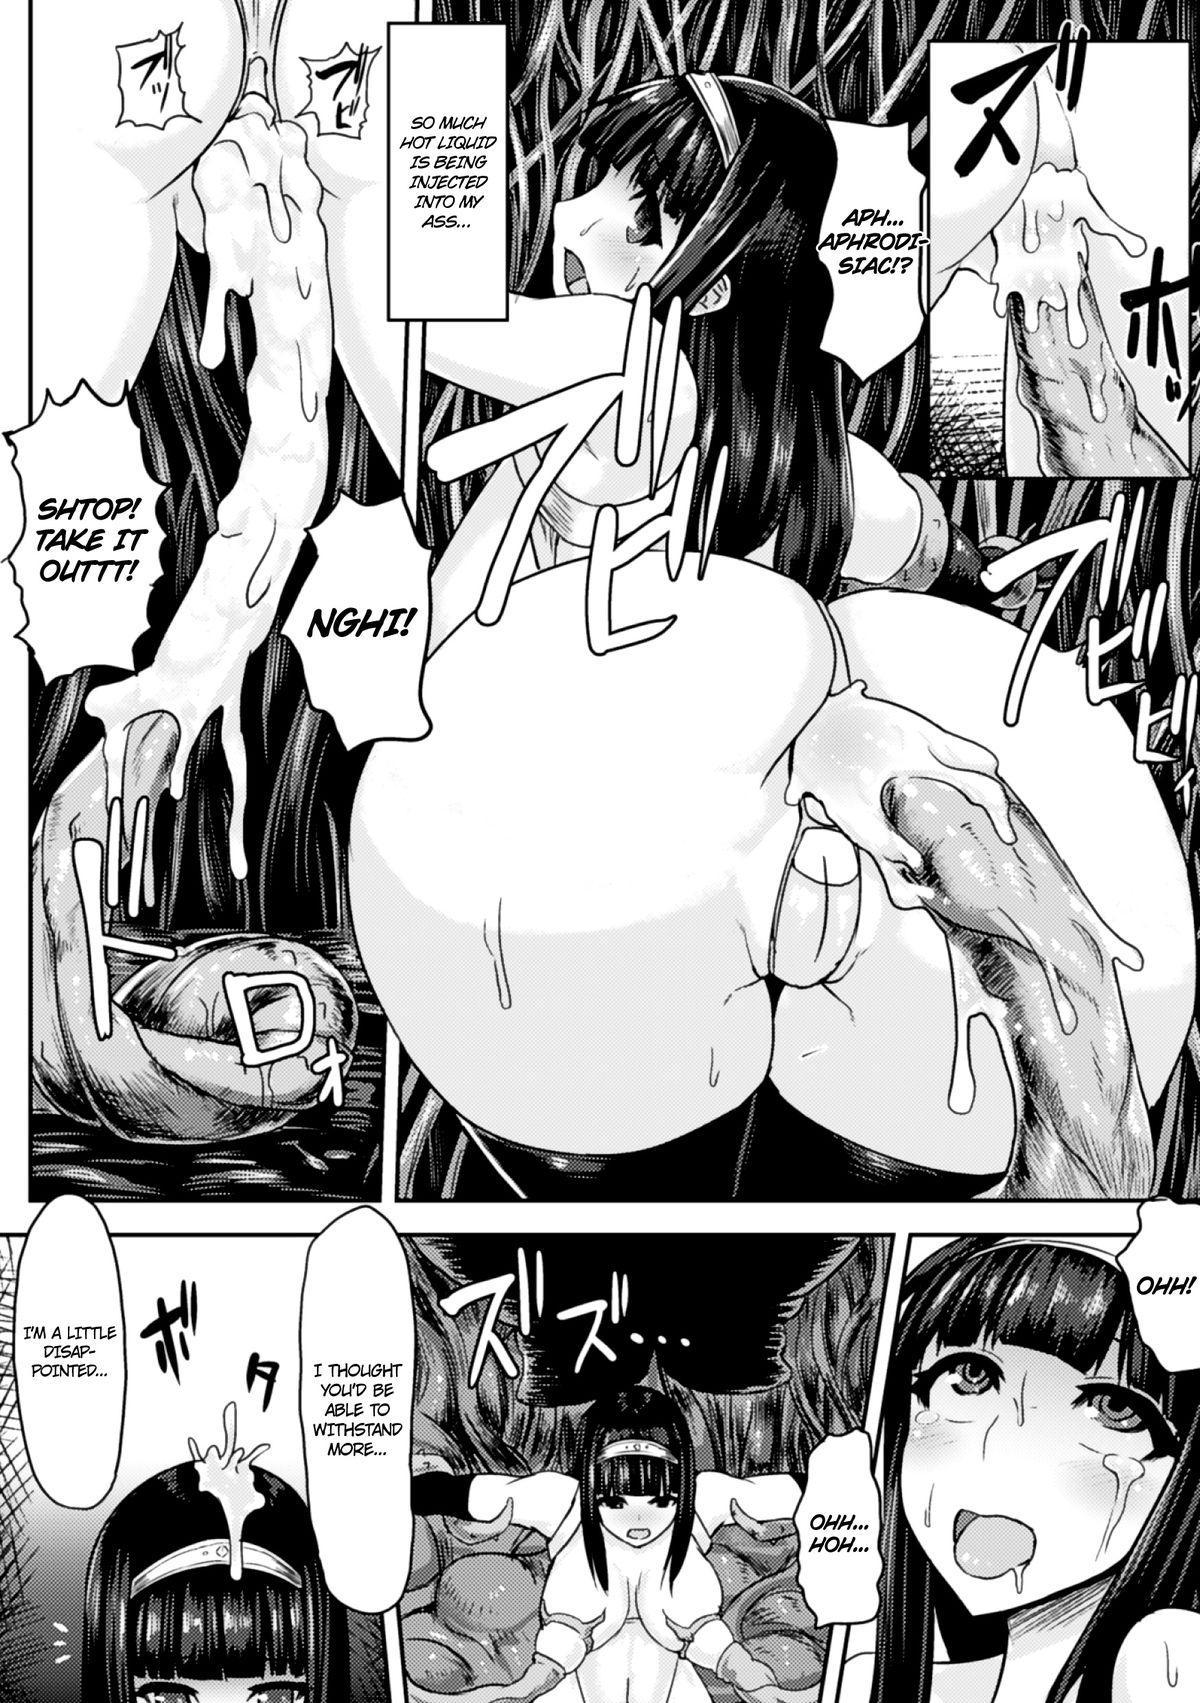 2D Comic Magazine Shokubutsukan de Monzetsu Acme Saki! Vol. 2 19